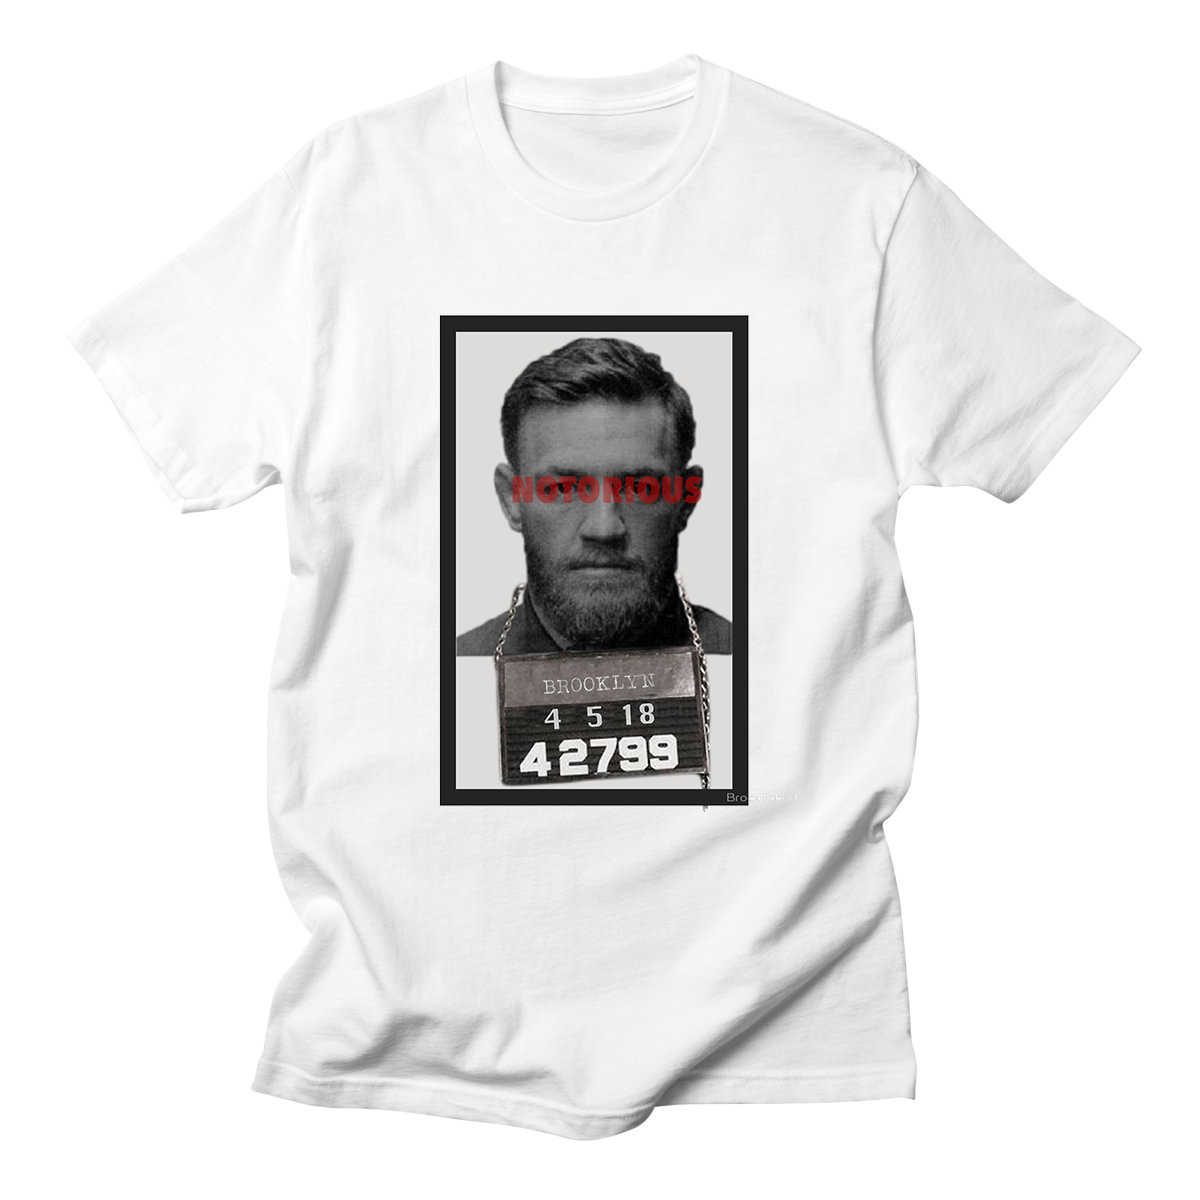 8d01d7c29 ... Khabib Nurmagomedov The Eagle Russian Ufc Fighter T-Shirt Short Sleeves  Printed T Shirt Funny ...